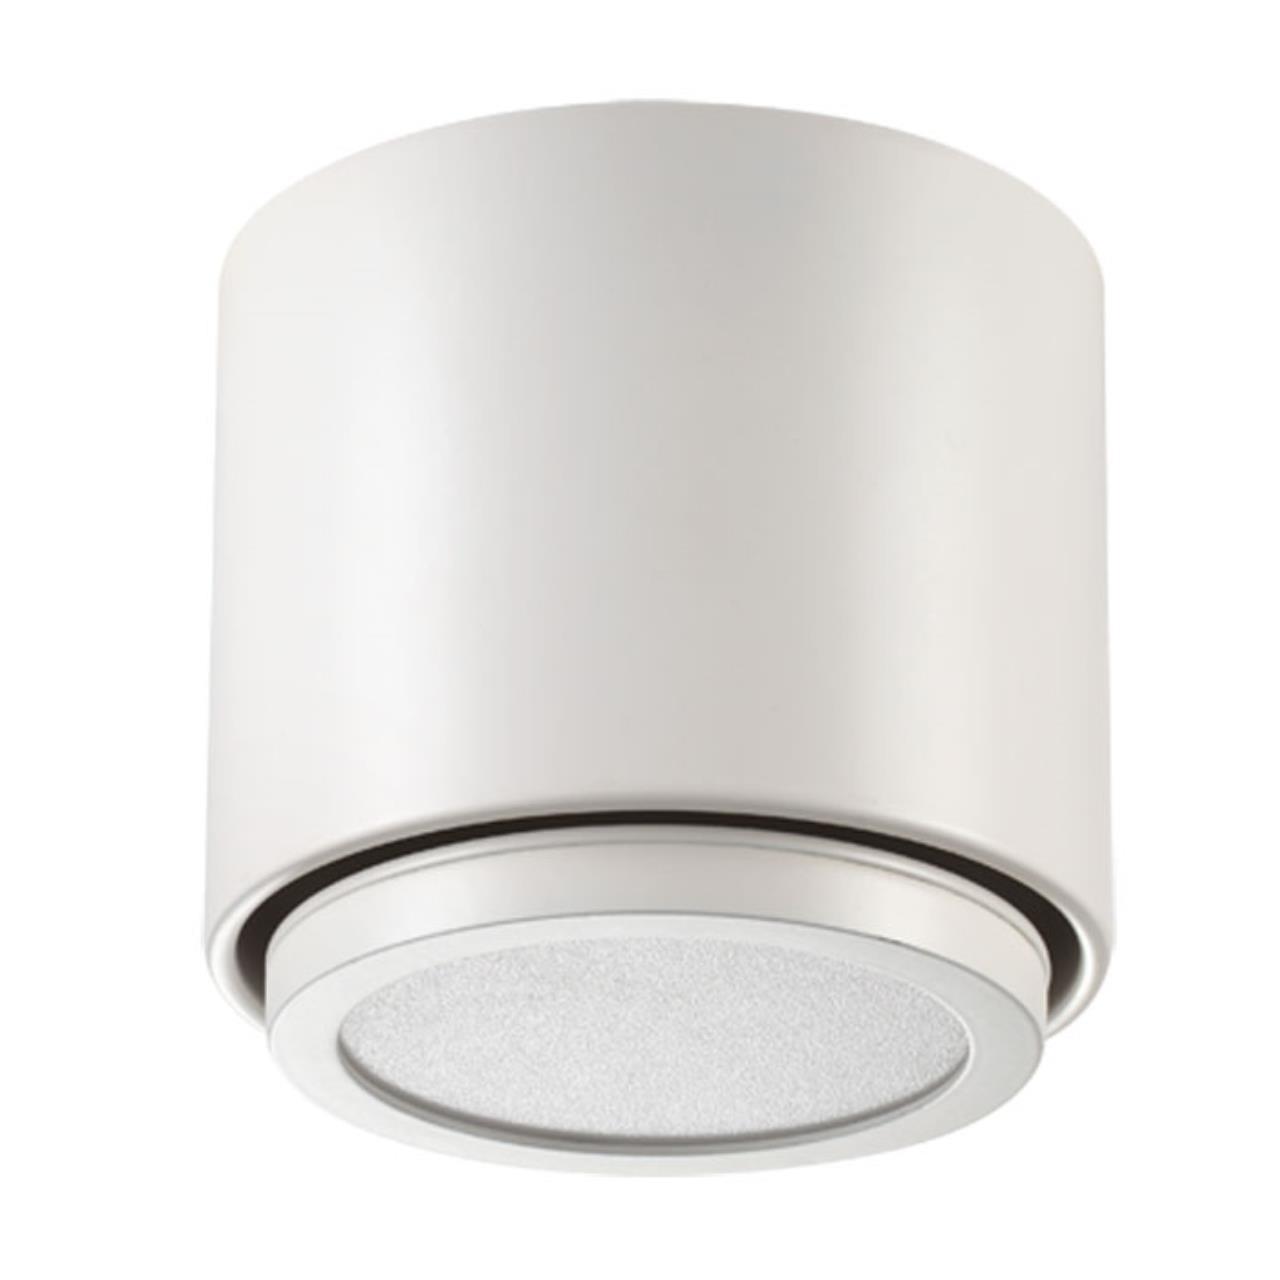 357455 OVER NT18 072 матовый белый Накладной светильник IP20 LED 3000K 8W+3W 100-240V SOLO